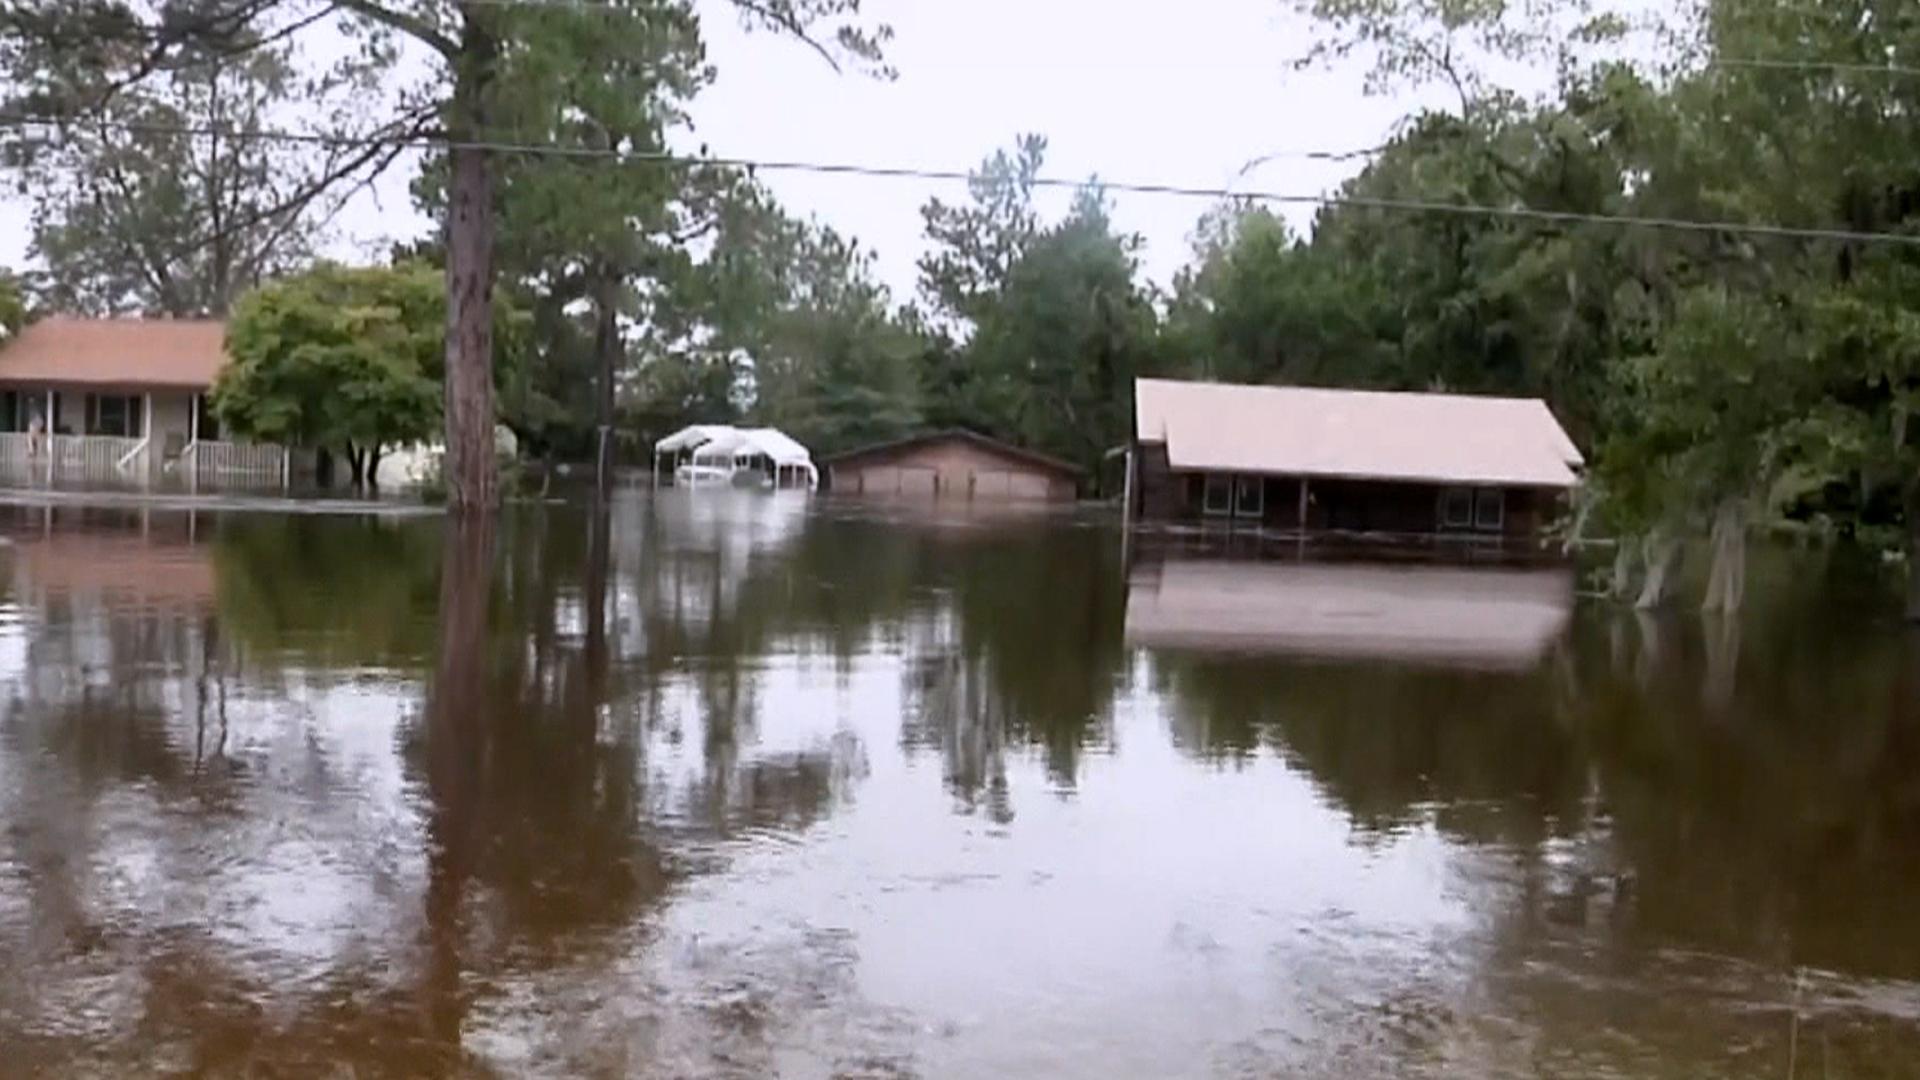 South Carolina on alert for dam breaks after historic